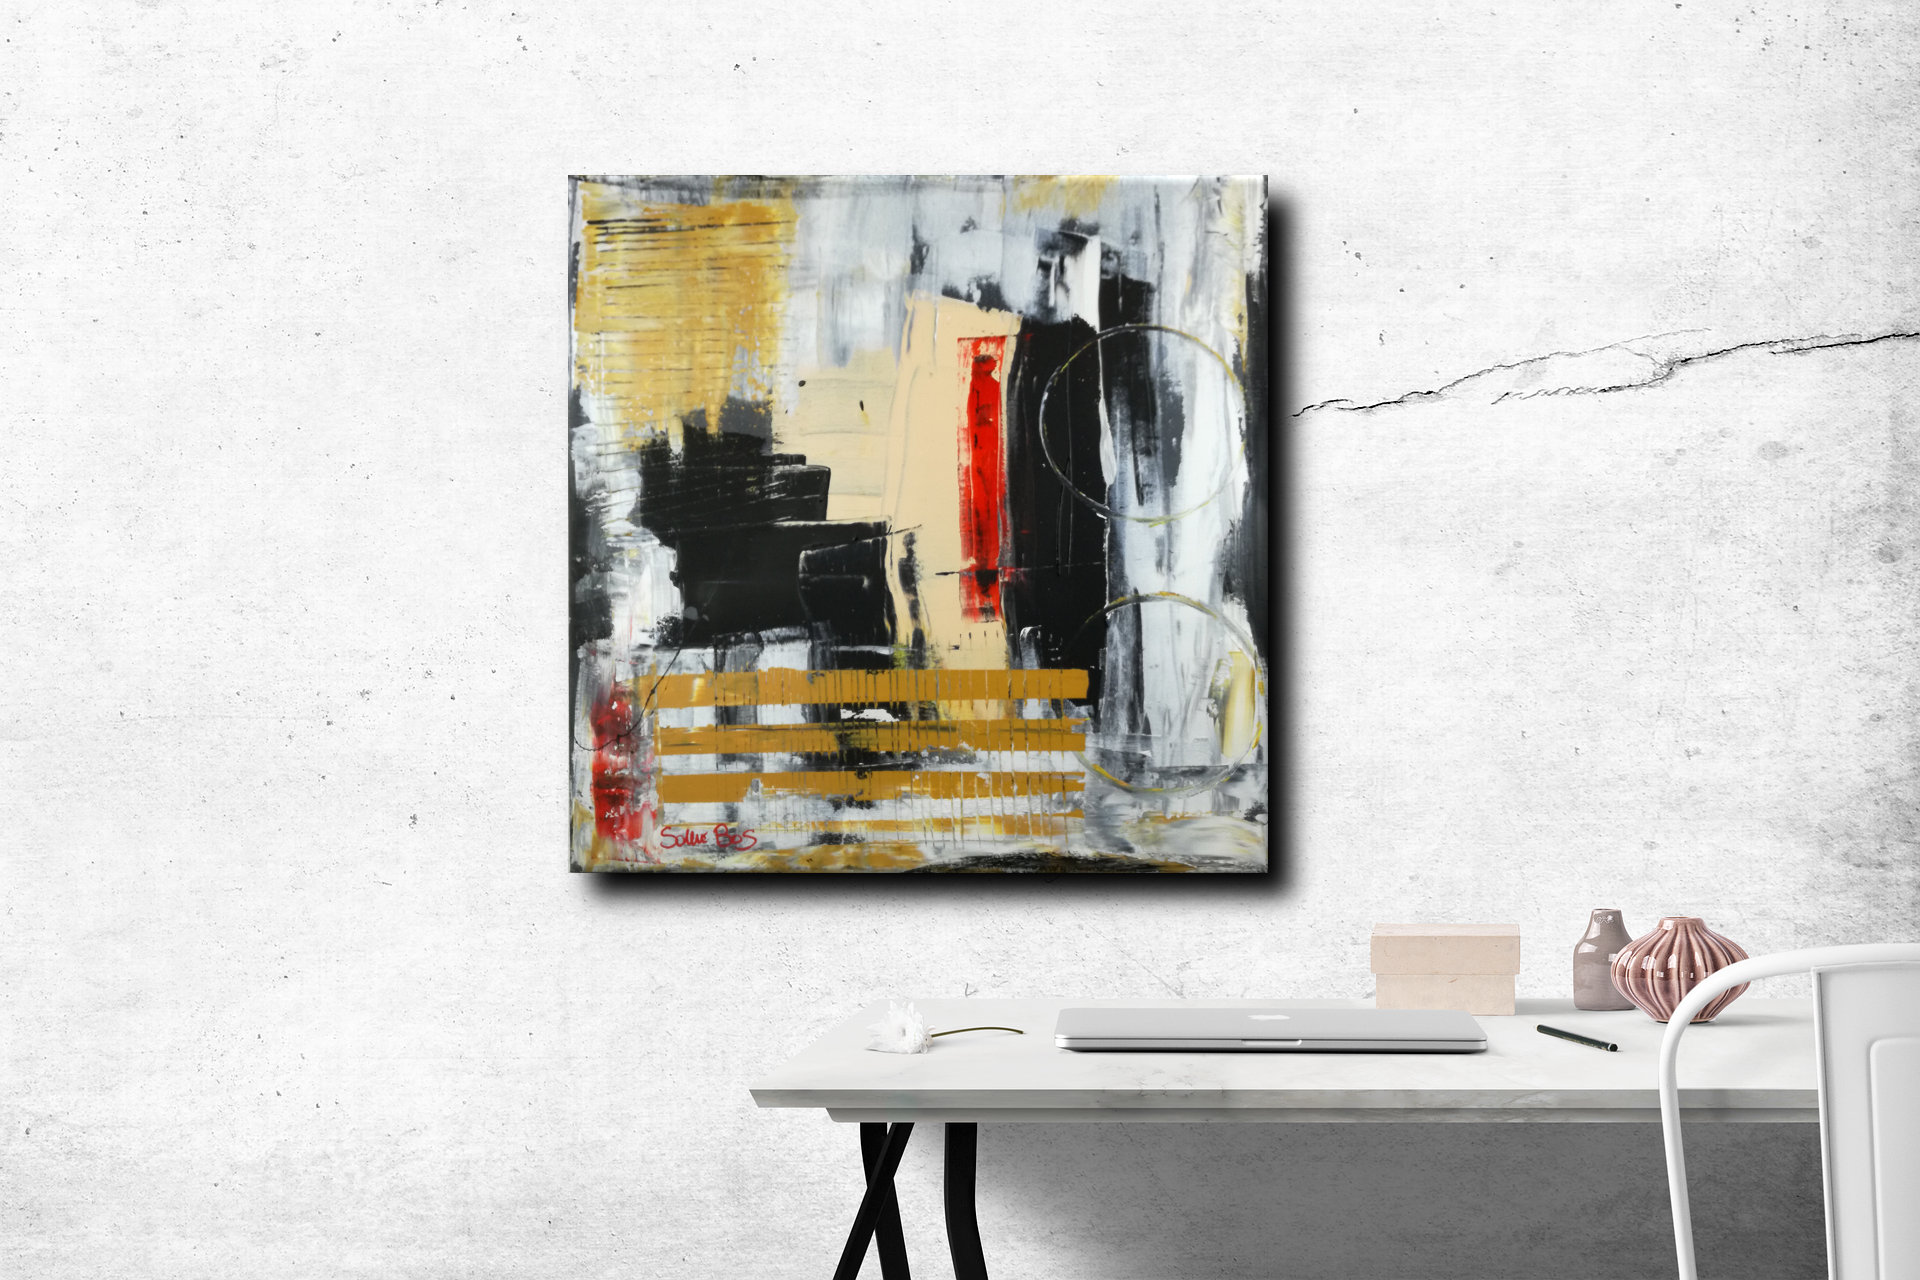 dipinti moderni c006 - quadri moderni  fatti a mano 70x70